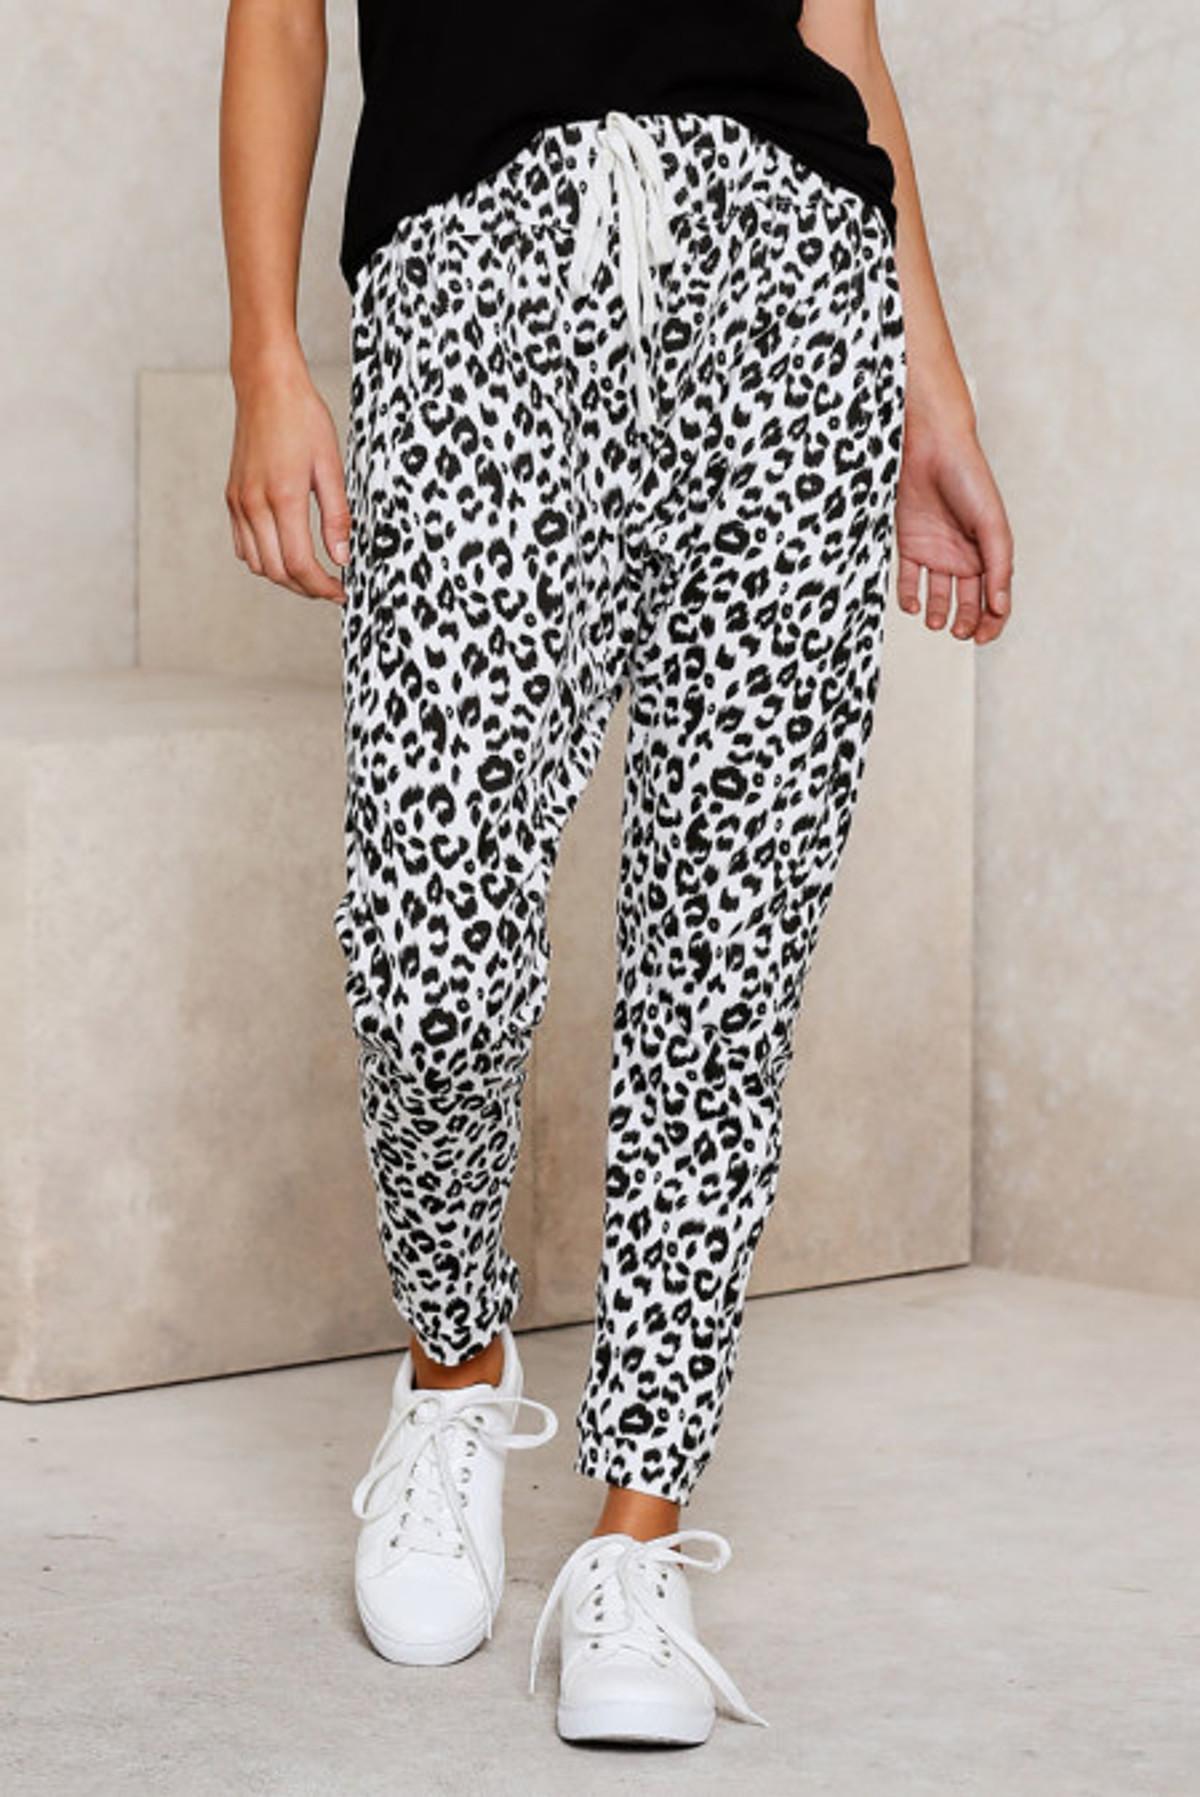 Leopard Print Lounge Pant (FRE77289-1 )  FRE772891WL